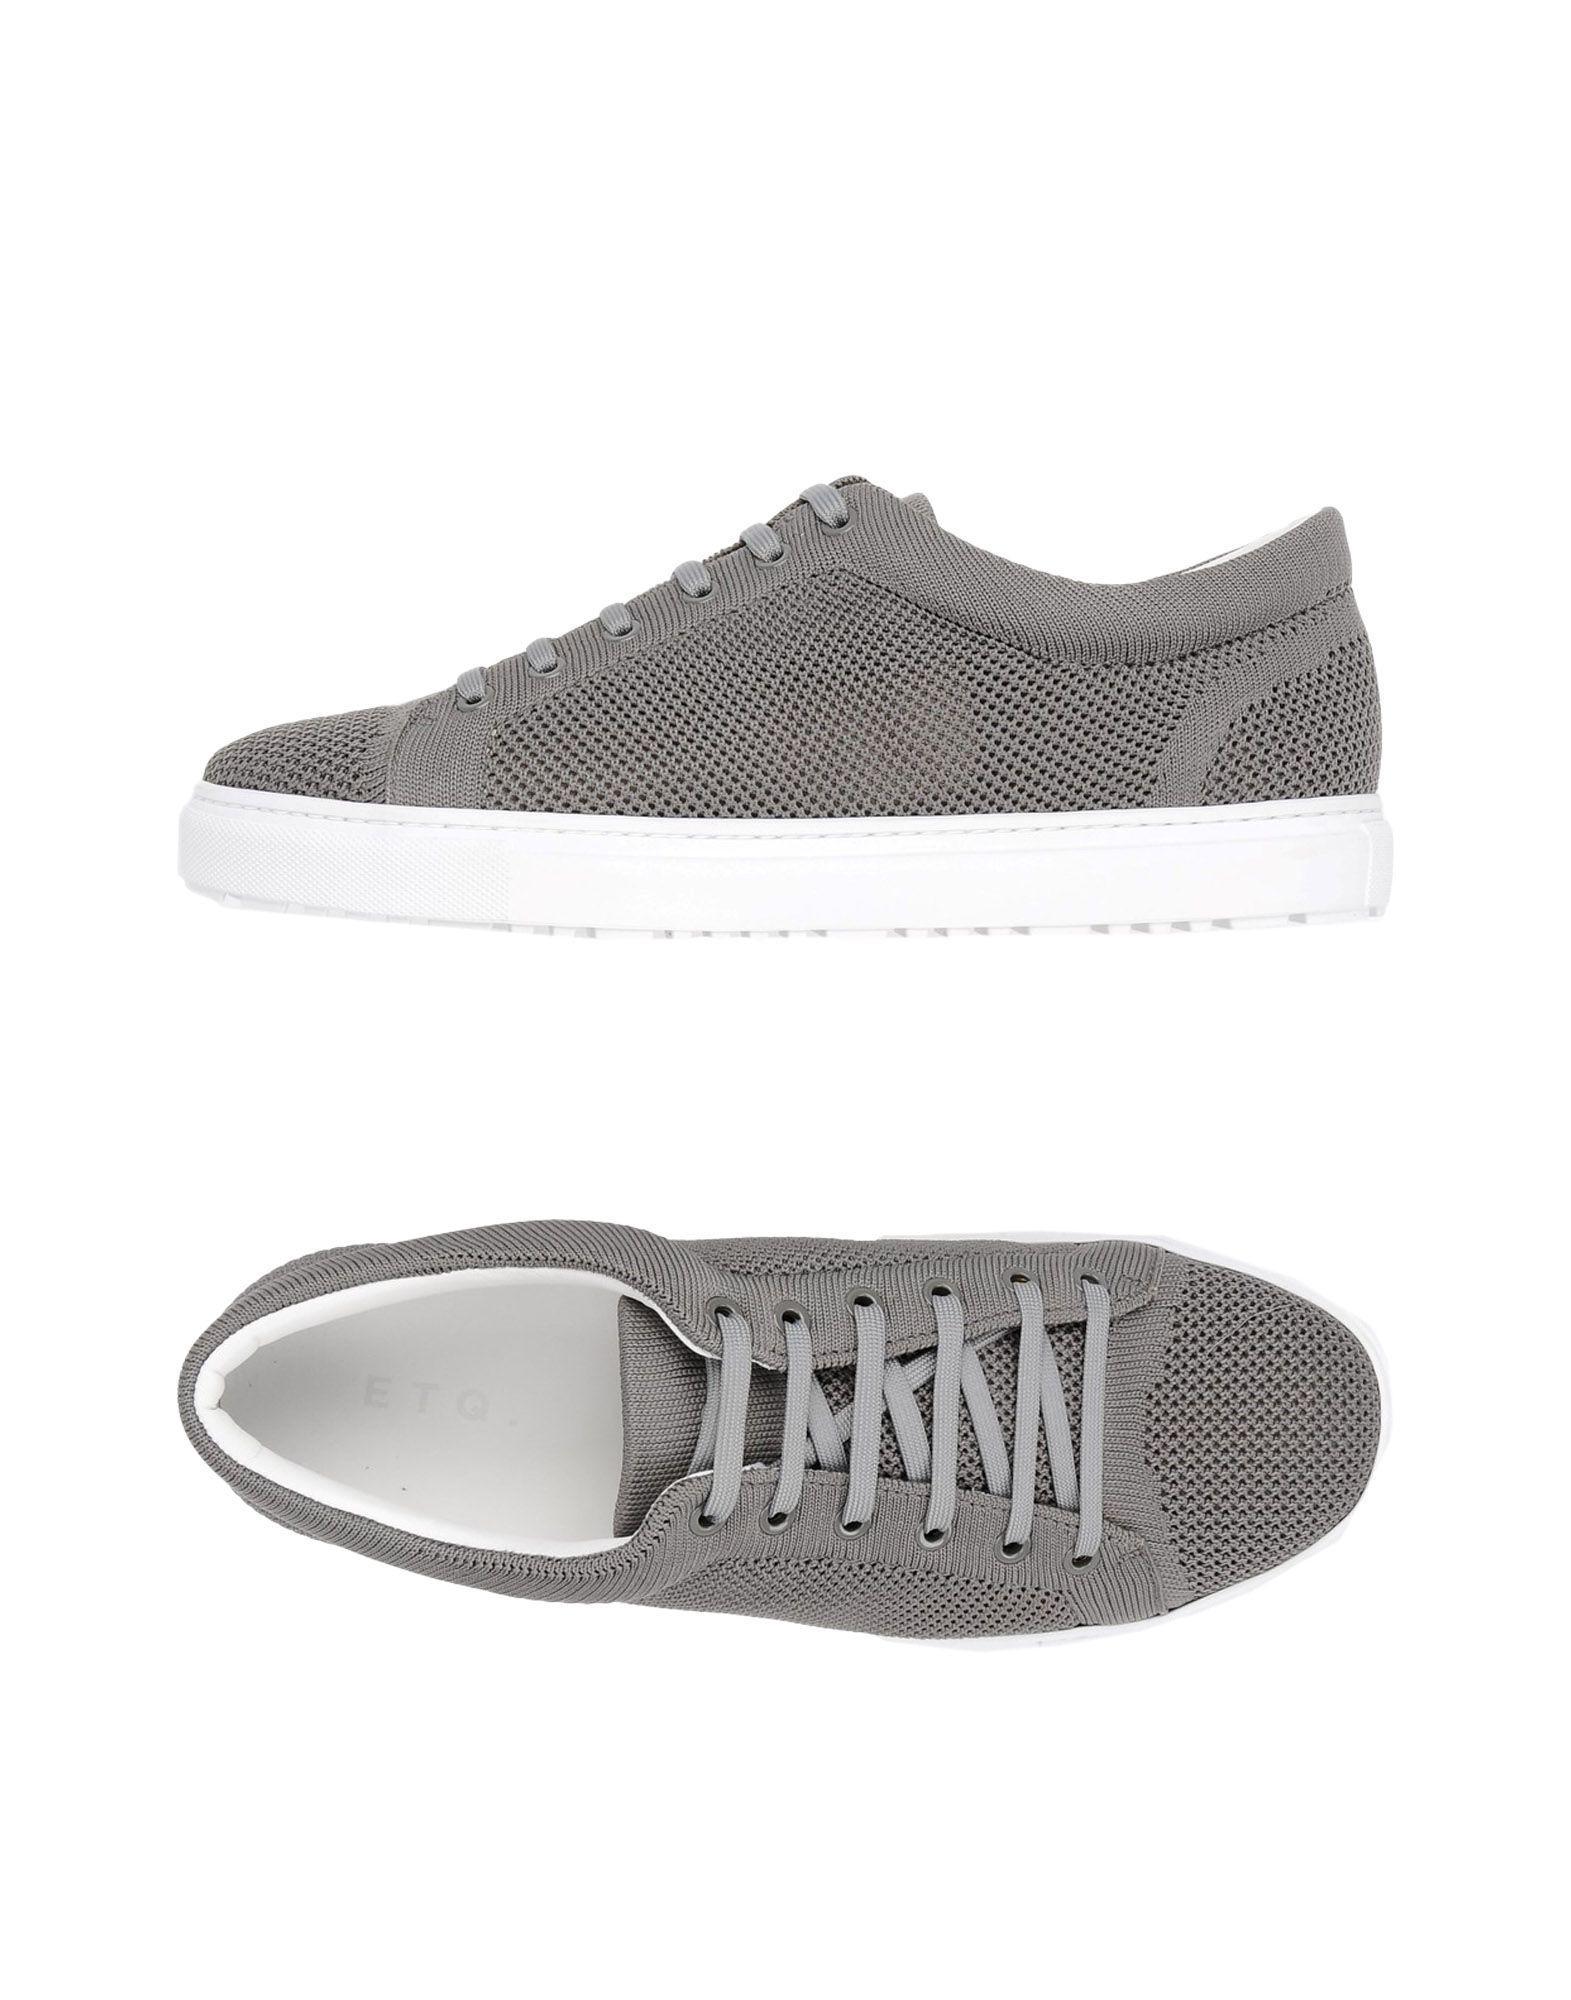 3c132c89c76 Lyst - ETQ Amsterdam Low-tops & Sneakers in Gray for Men